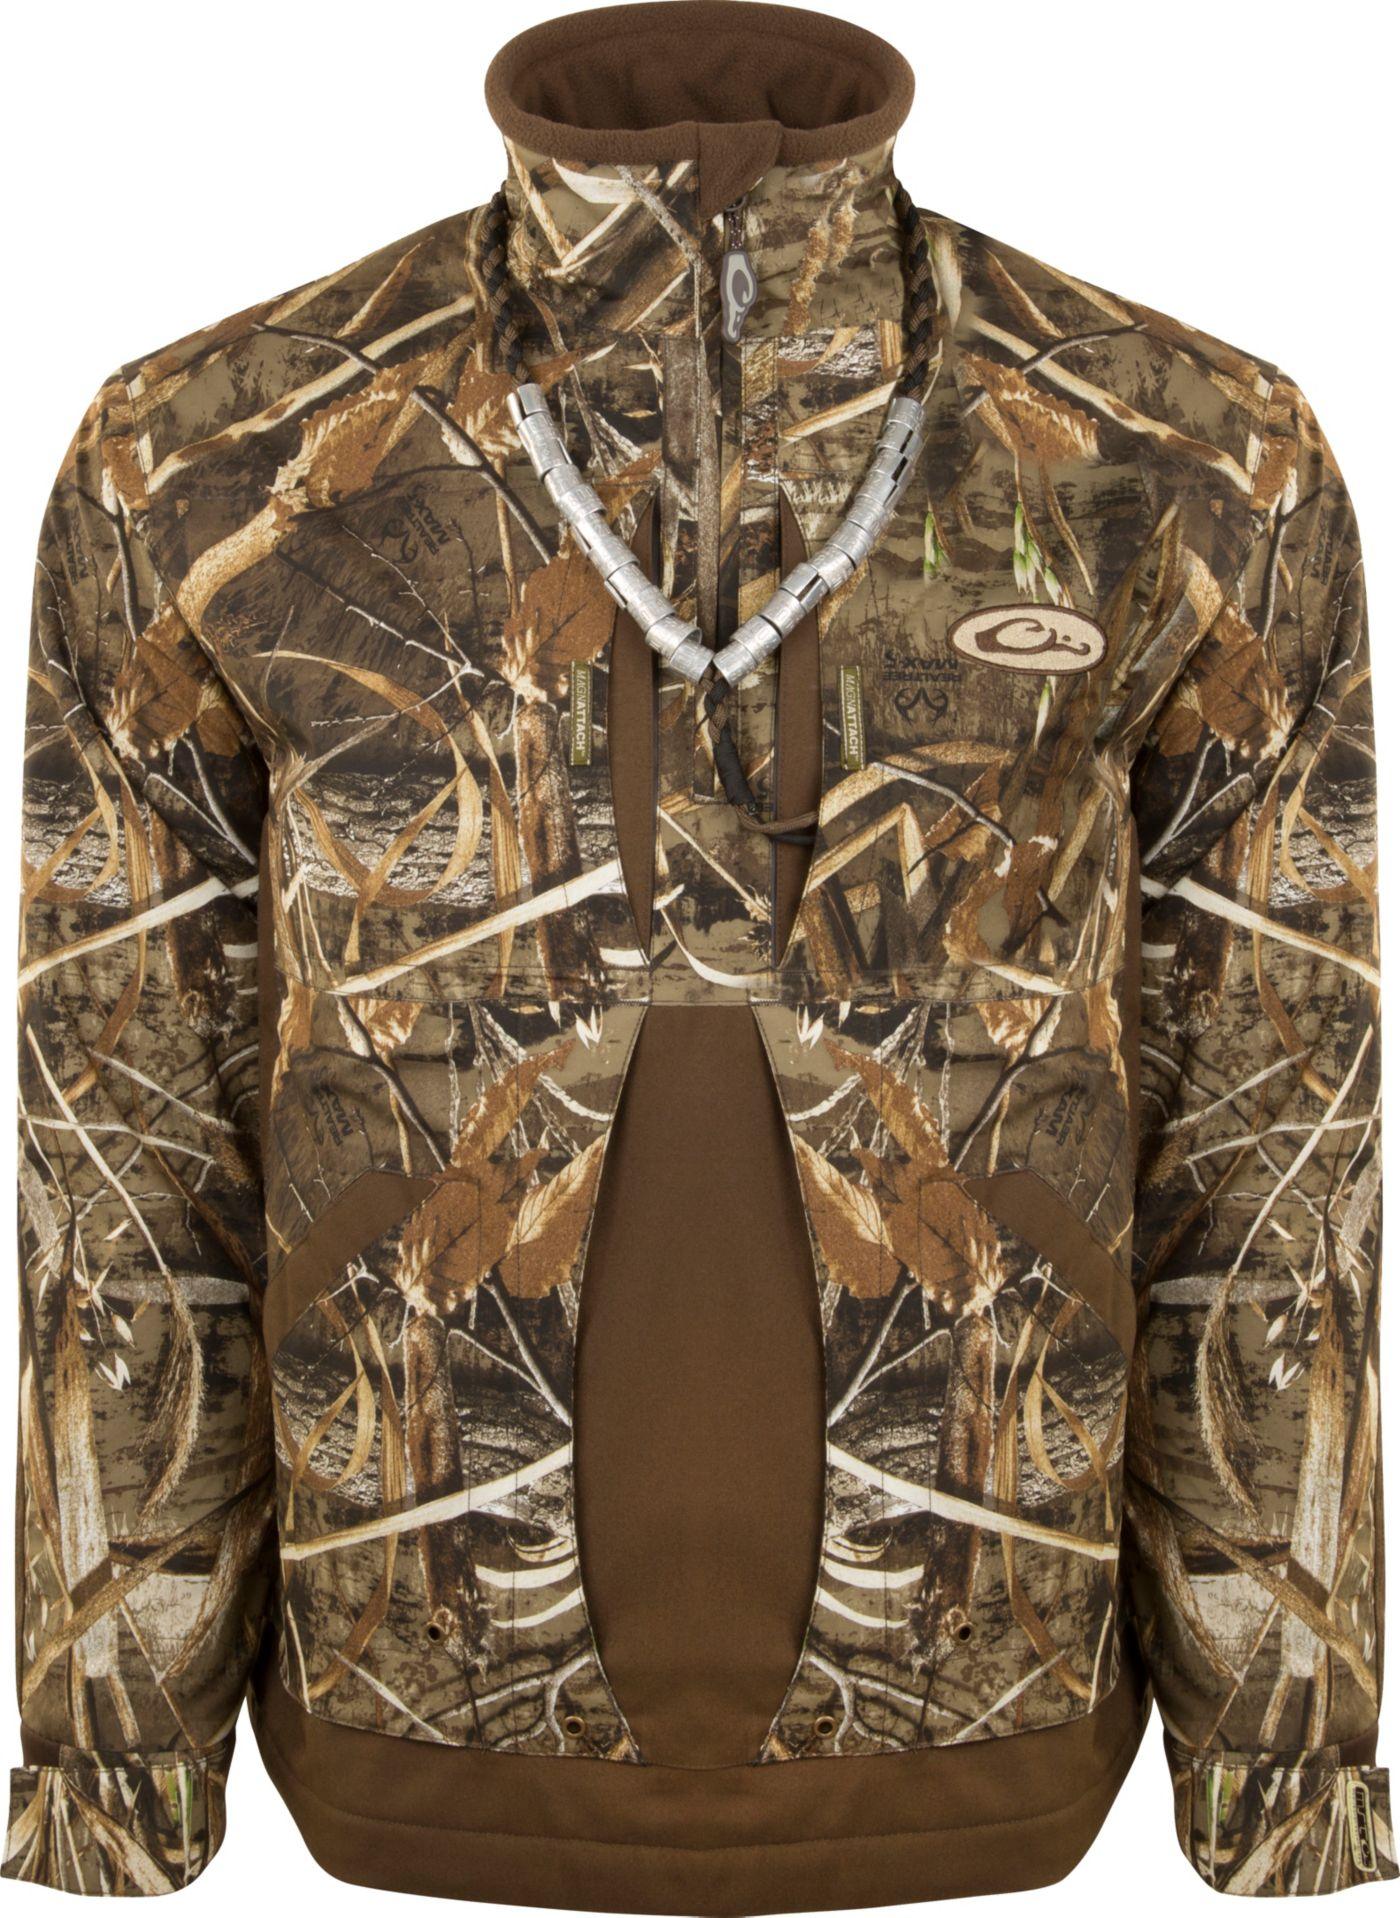 Drake Waterfowl Guardian Flex 1/4 Zip Hunting Jacket